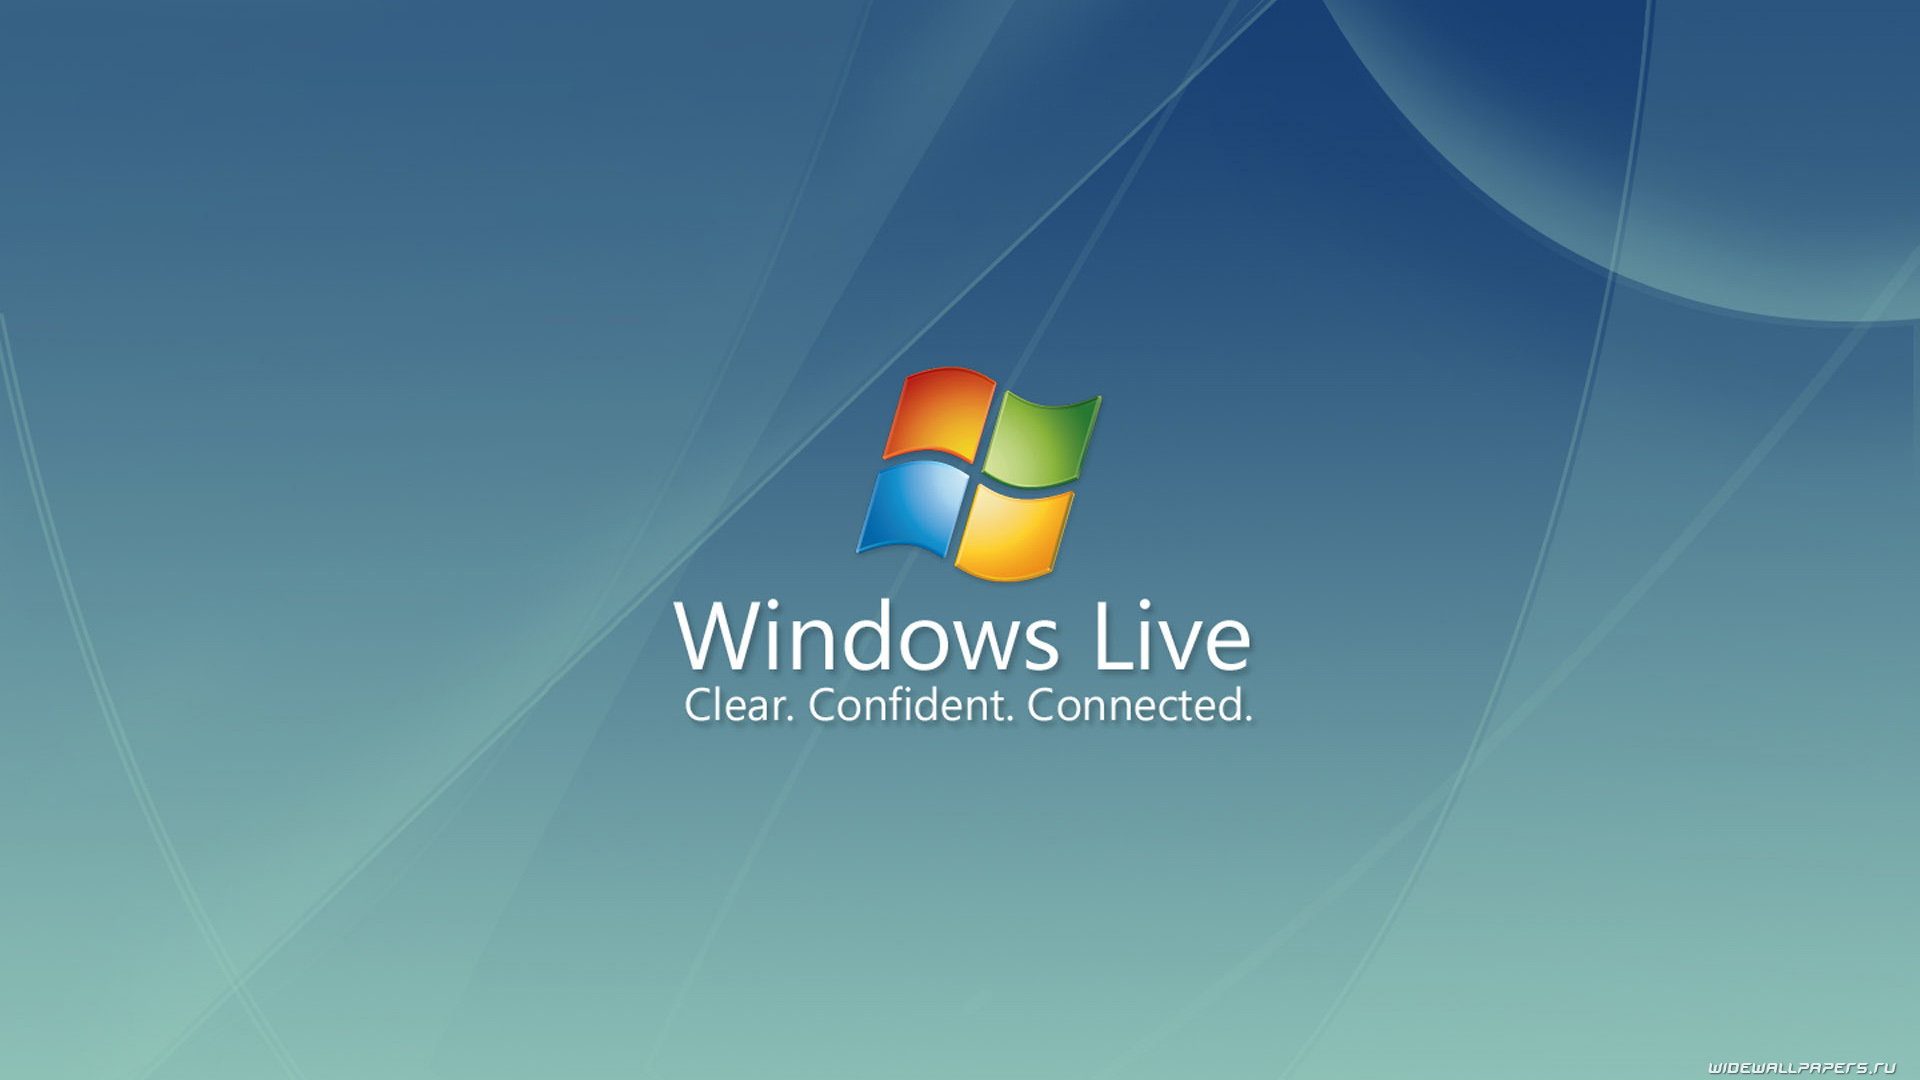 Windows live wallpaper for pc